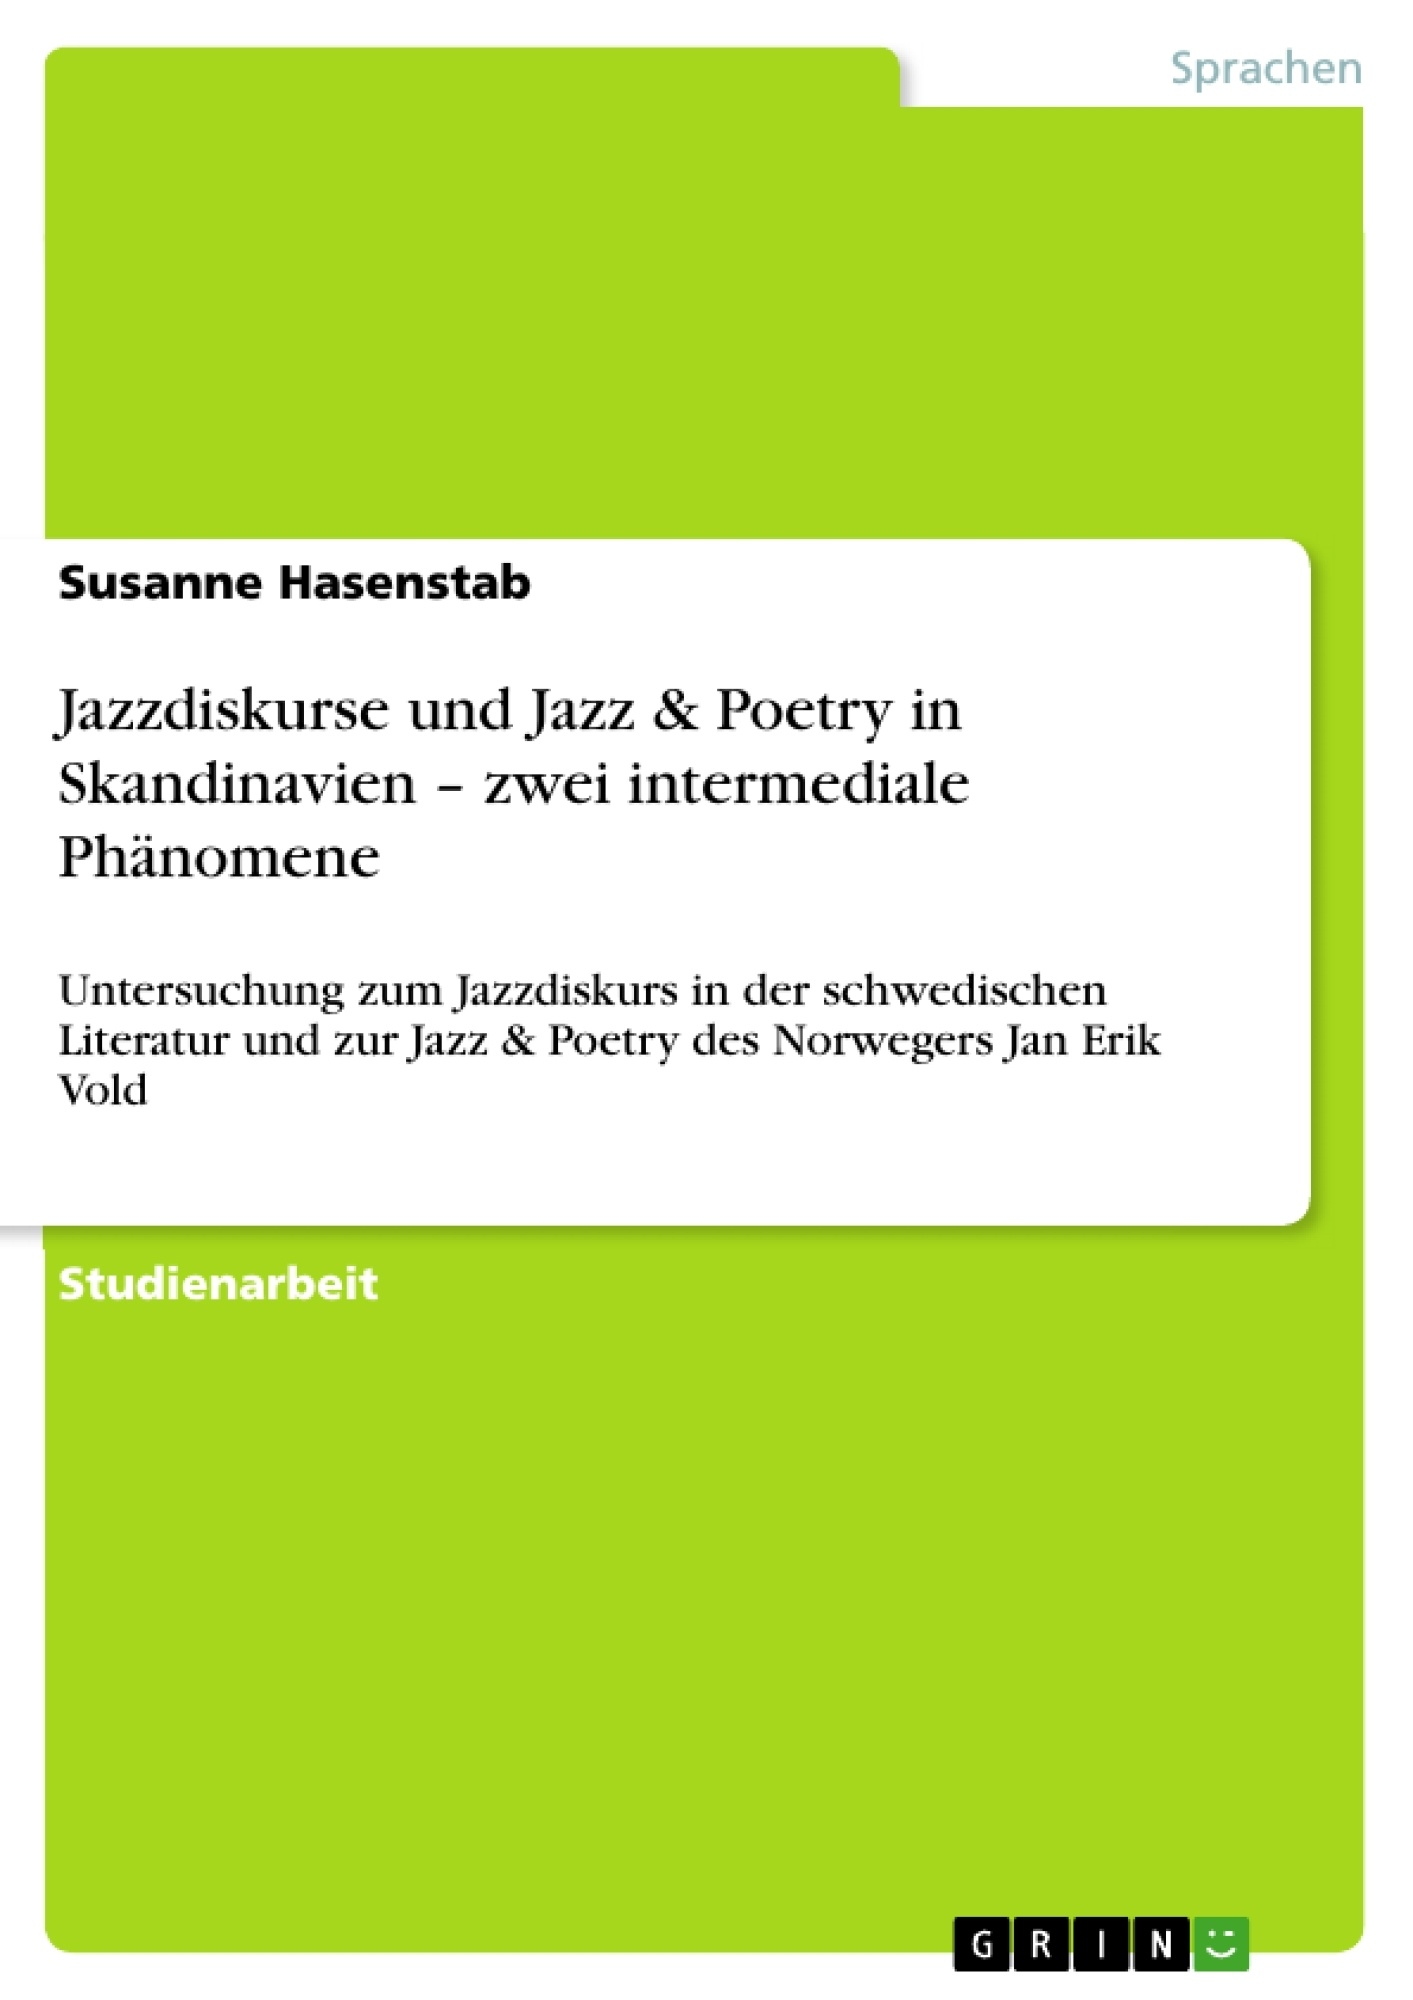 Titel: Jazzdiskurse und Jazz & Poetry in Skandinavien – zwei intermediale Phänomene